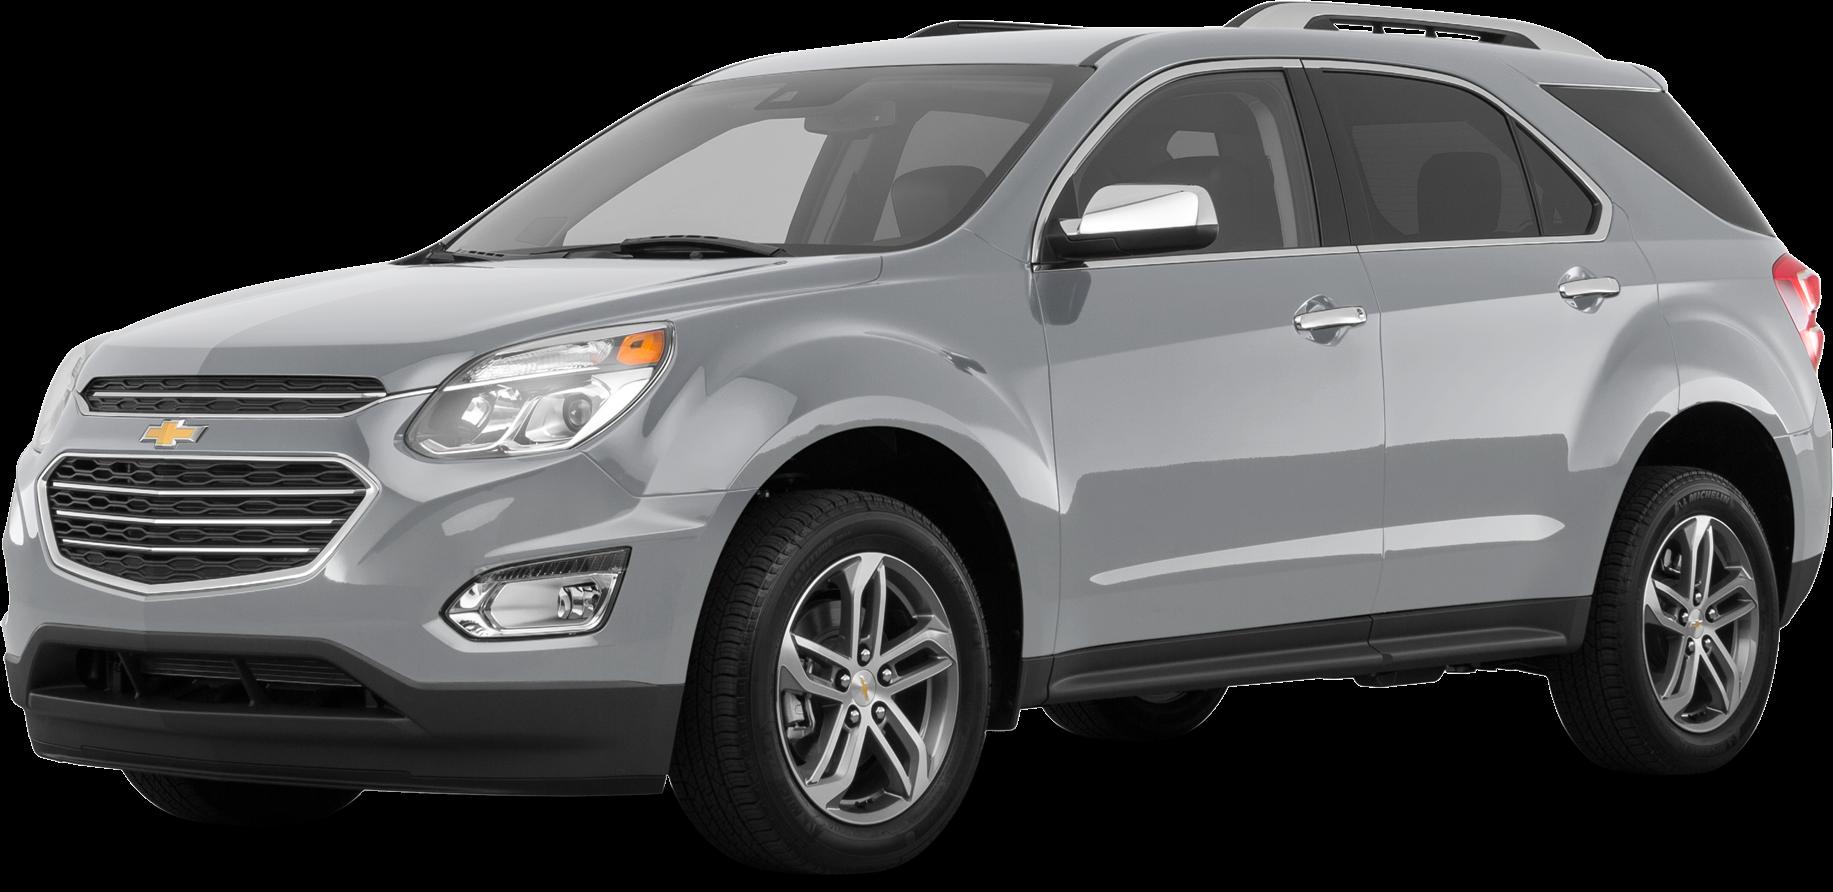 2017 Chevrolet Equinox Prices Reviews